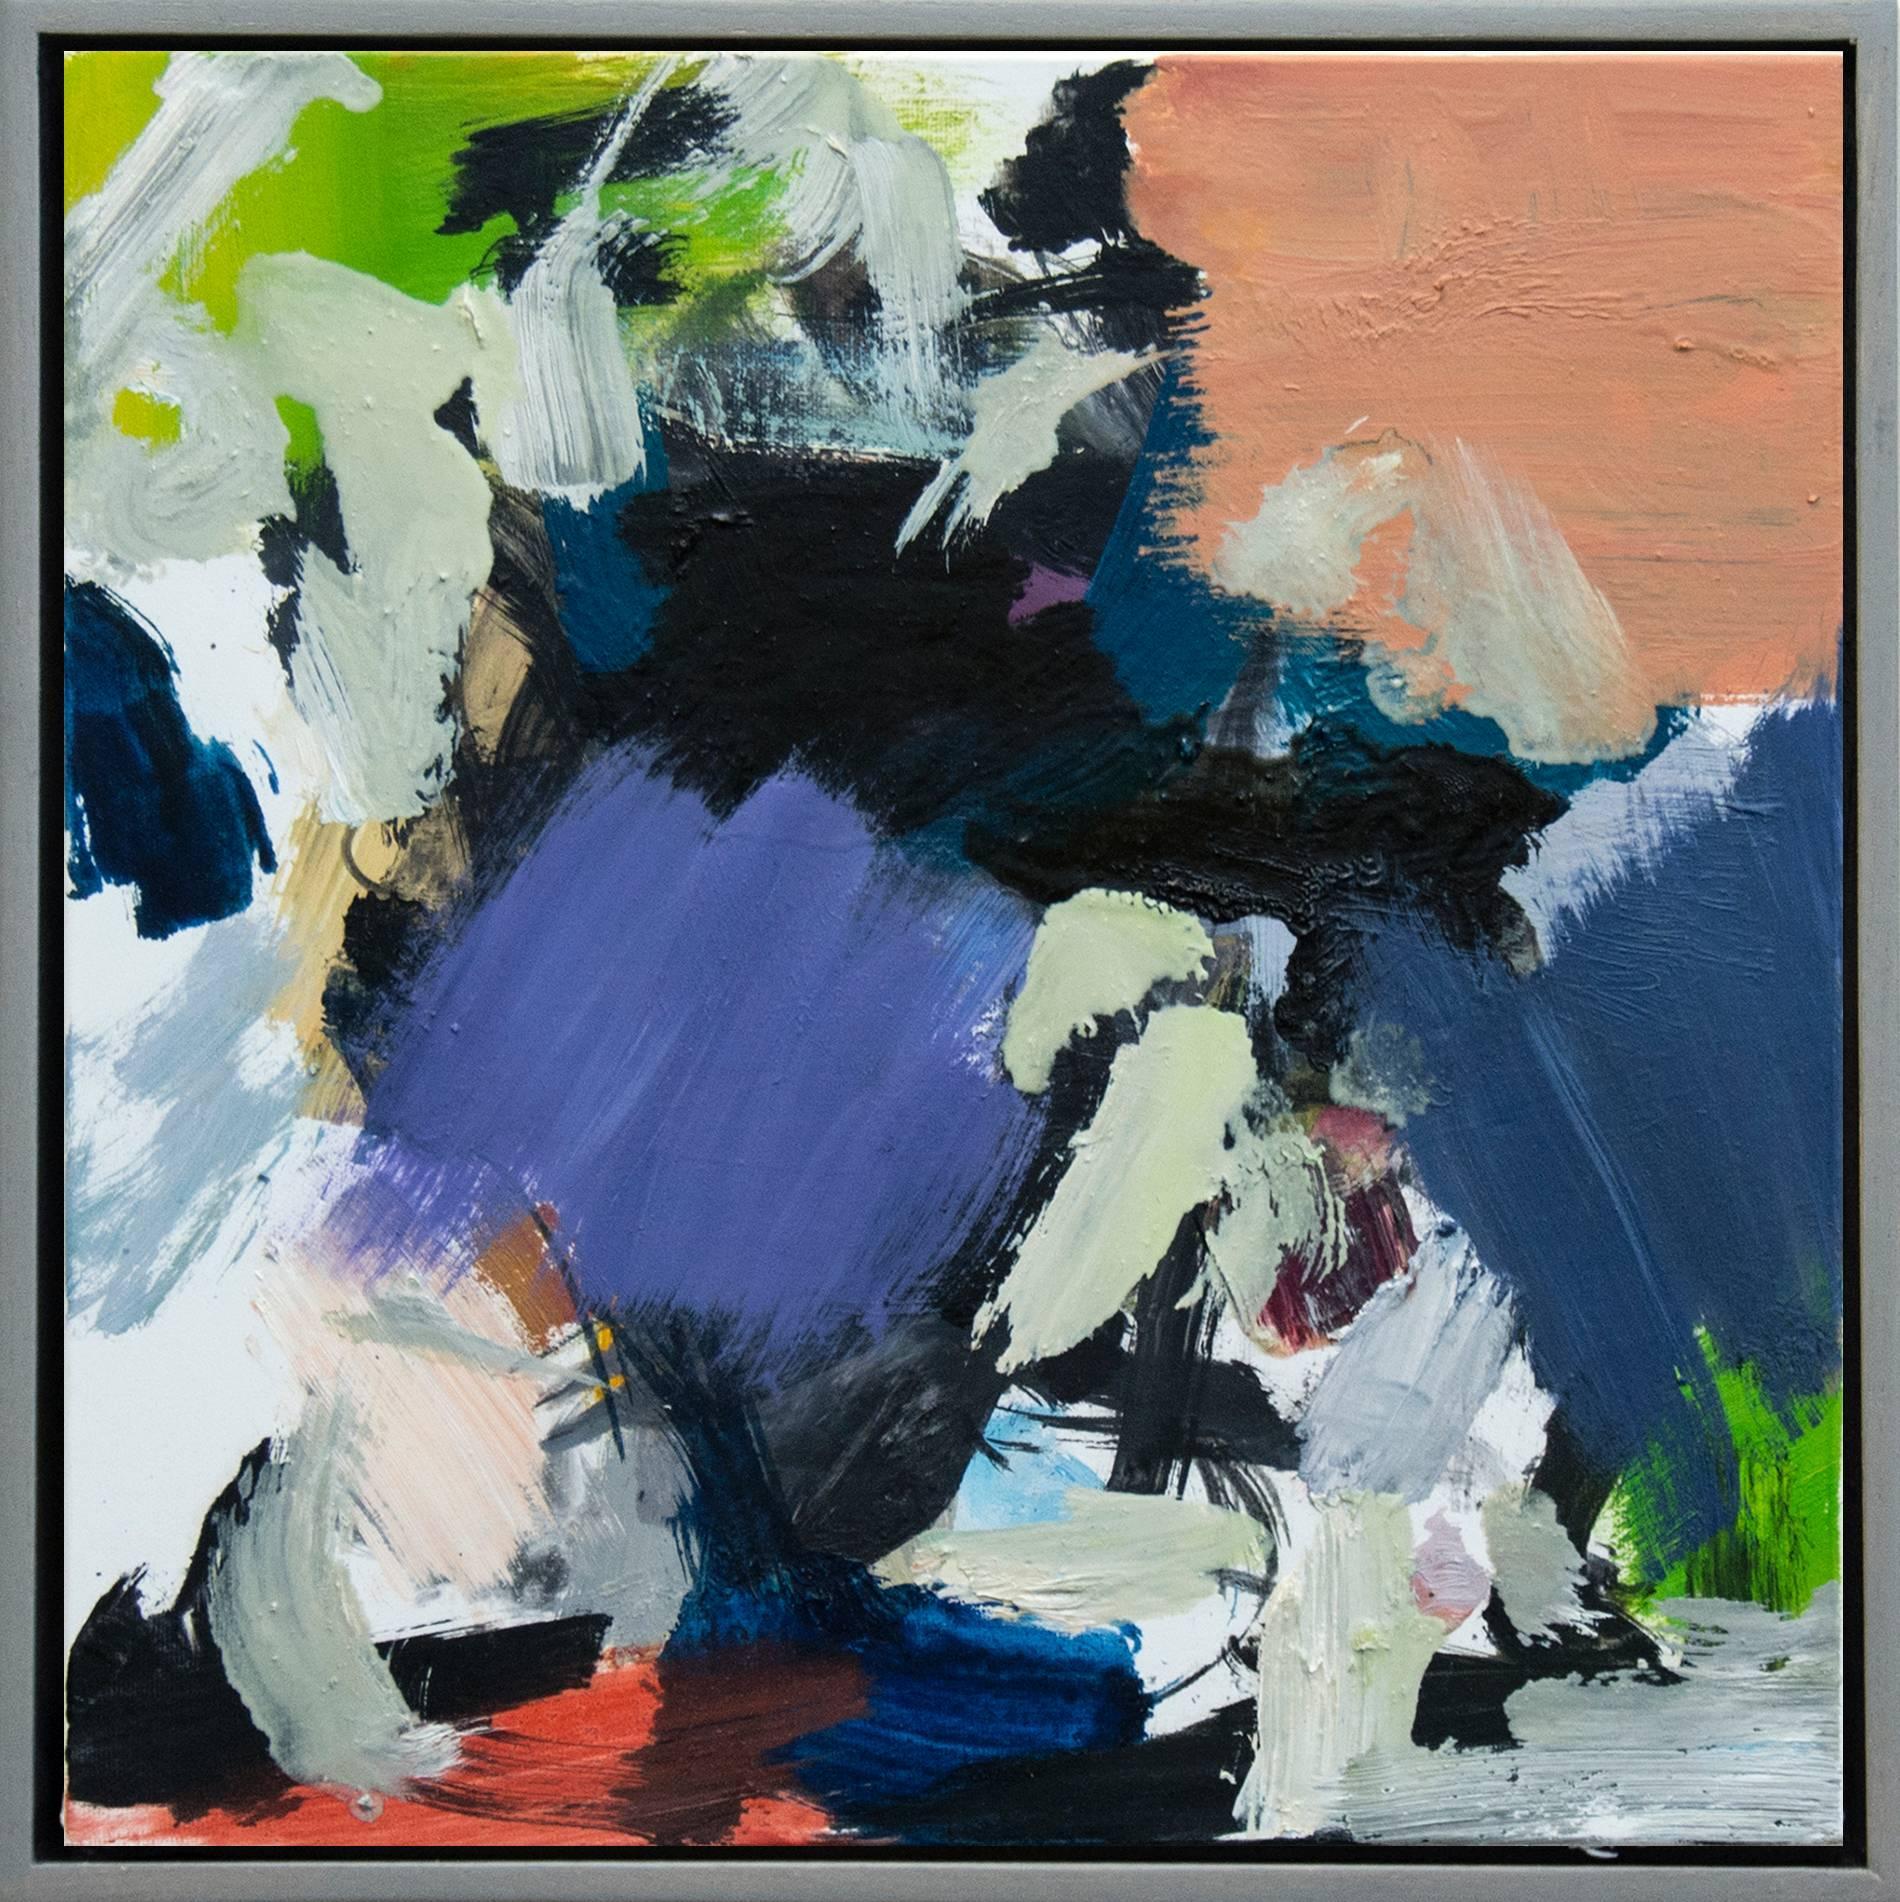 Kairoi No 21 - small blue, white, peach, green, gestural abstract, oil on canvas